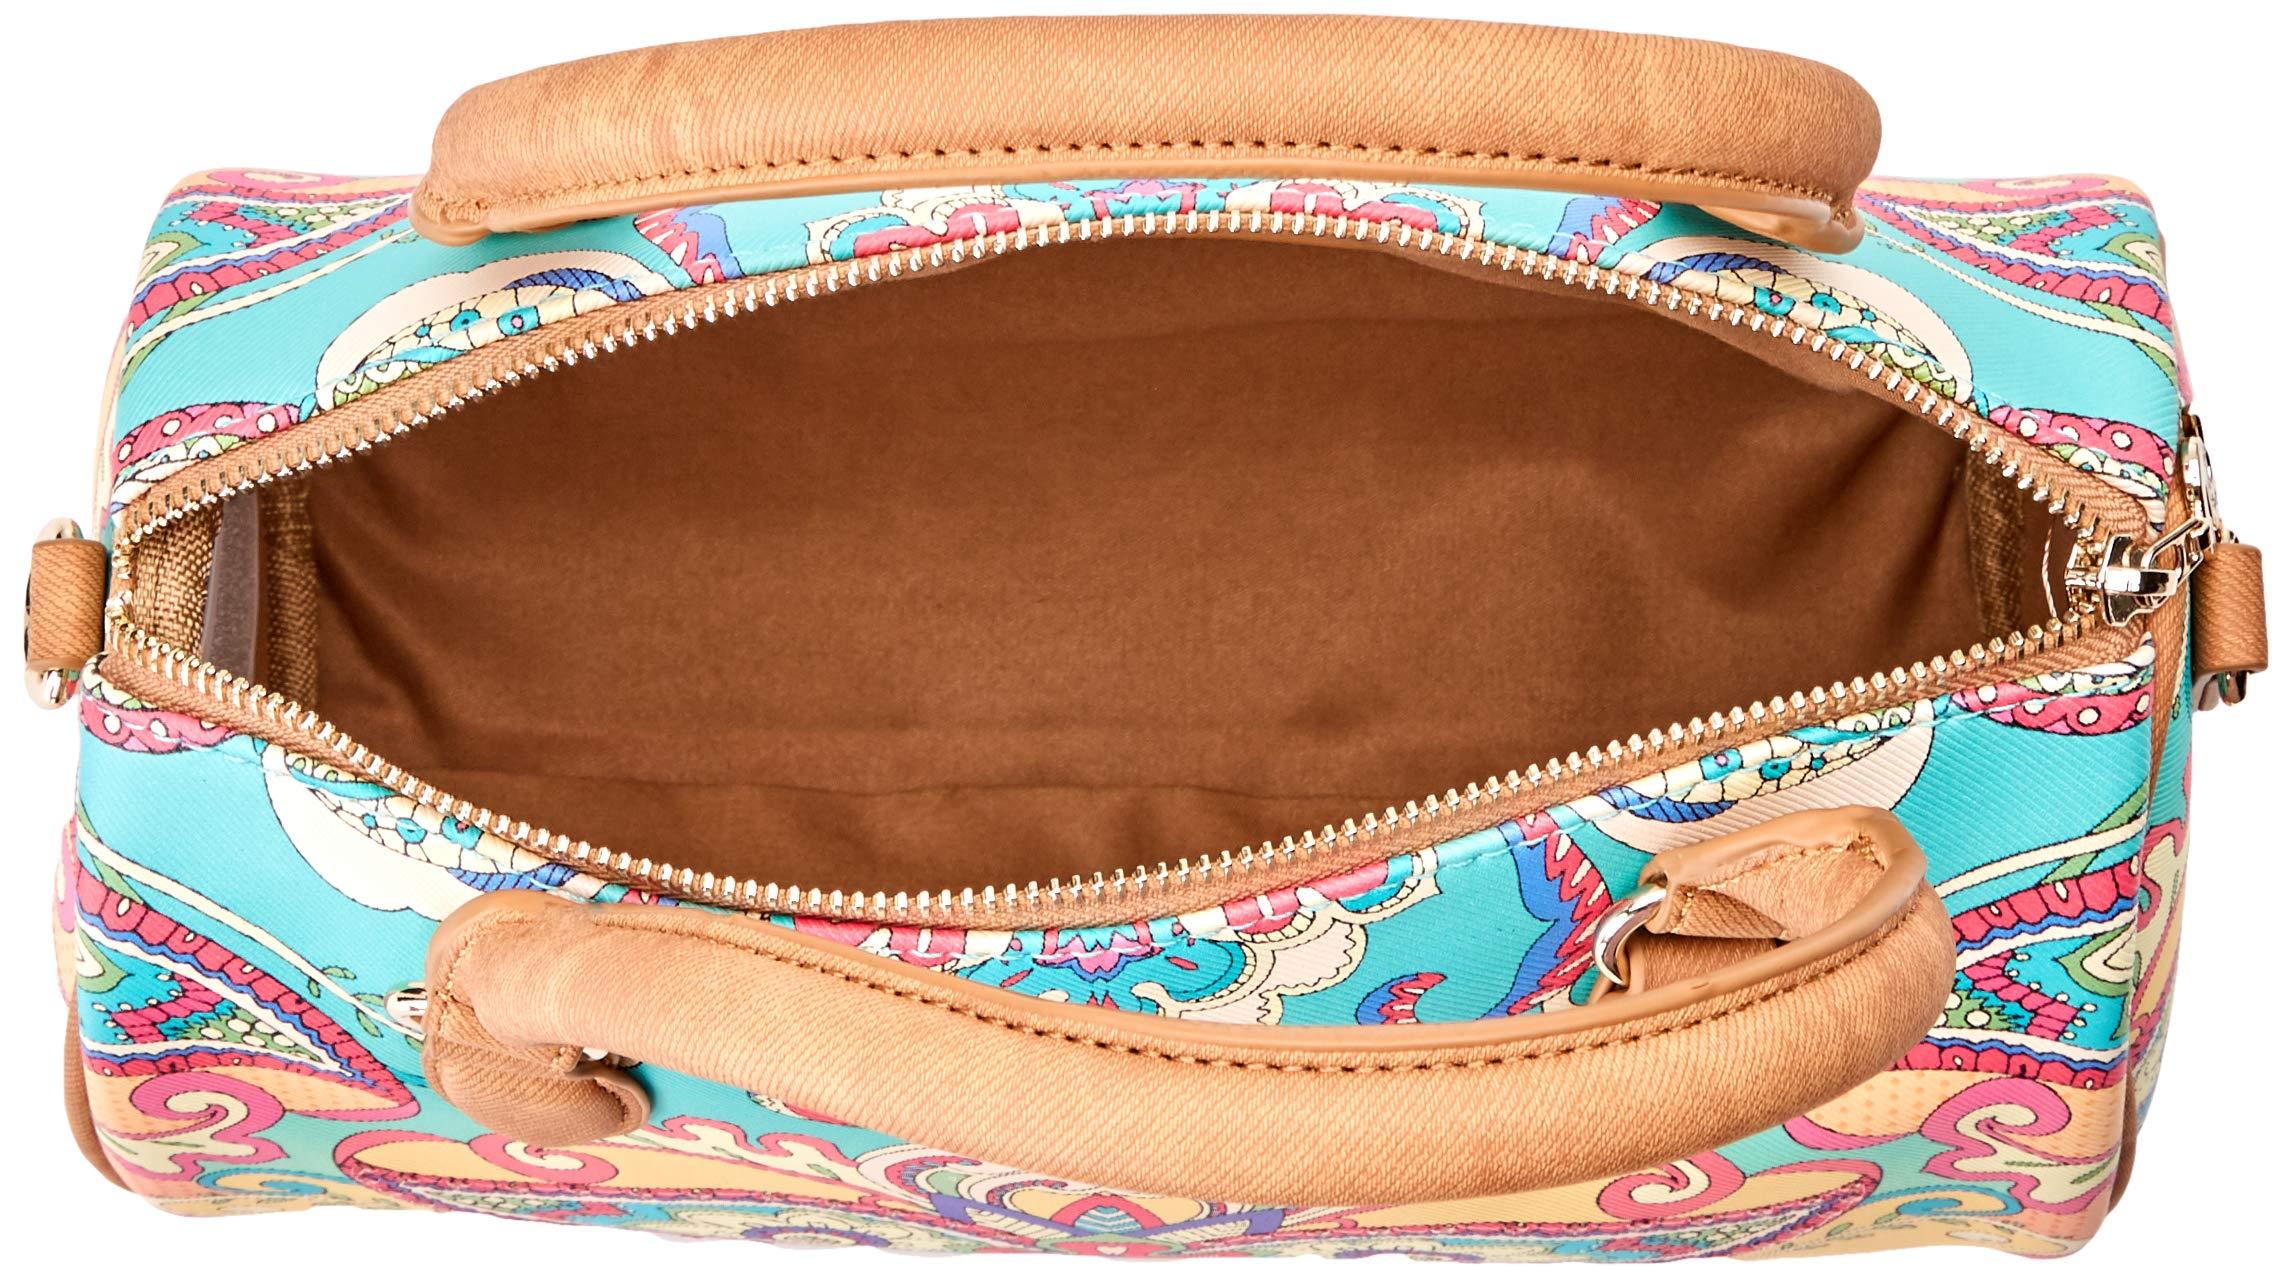 Desigual Bag Grand Valkiria Bowling Med Women - Borsette da polso Donna, Arancione (Coral), 13.7x18x27 cm (B x H T) 5 spesavip